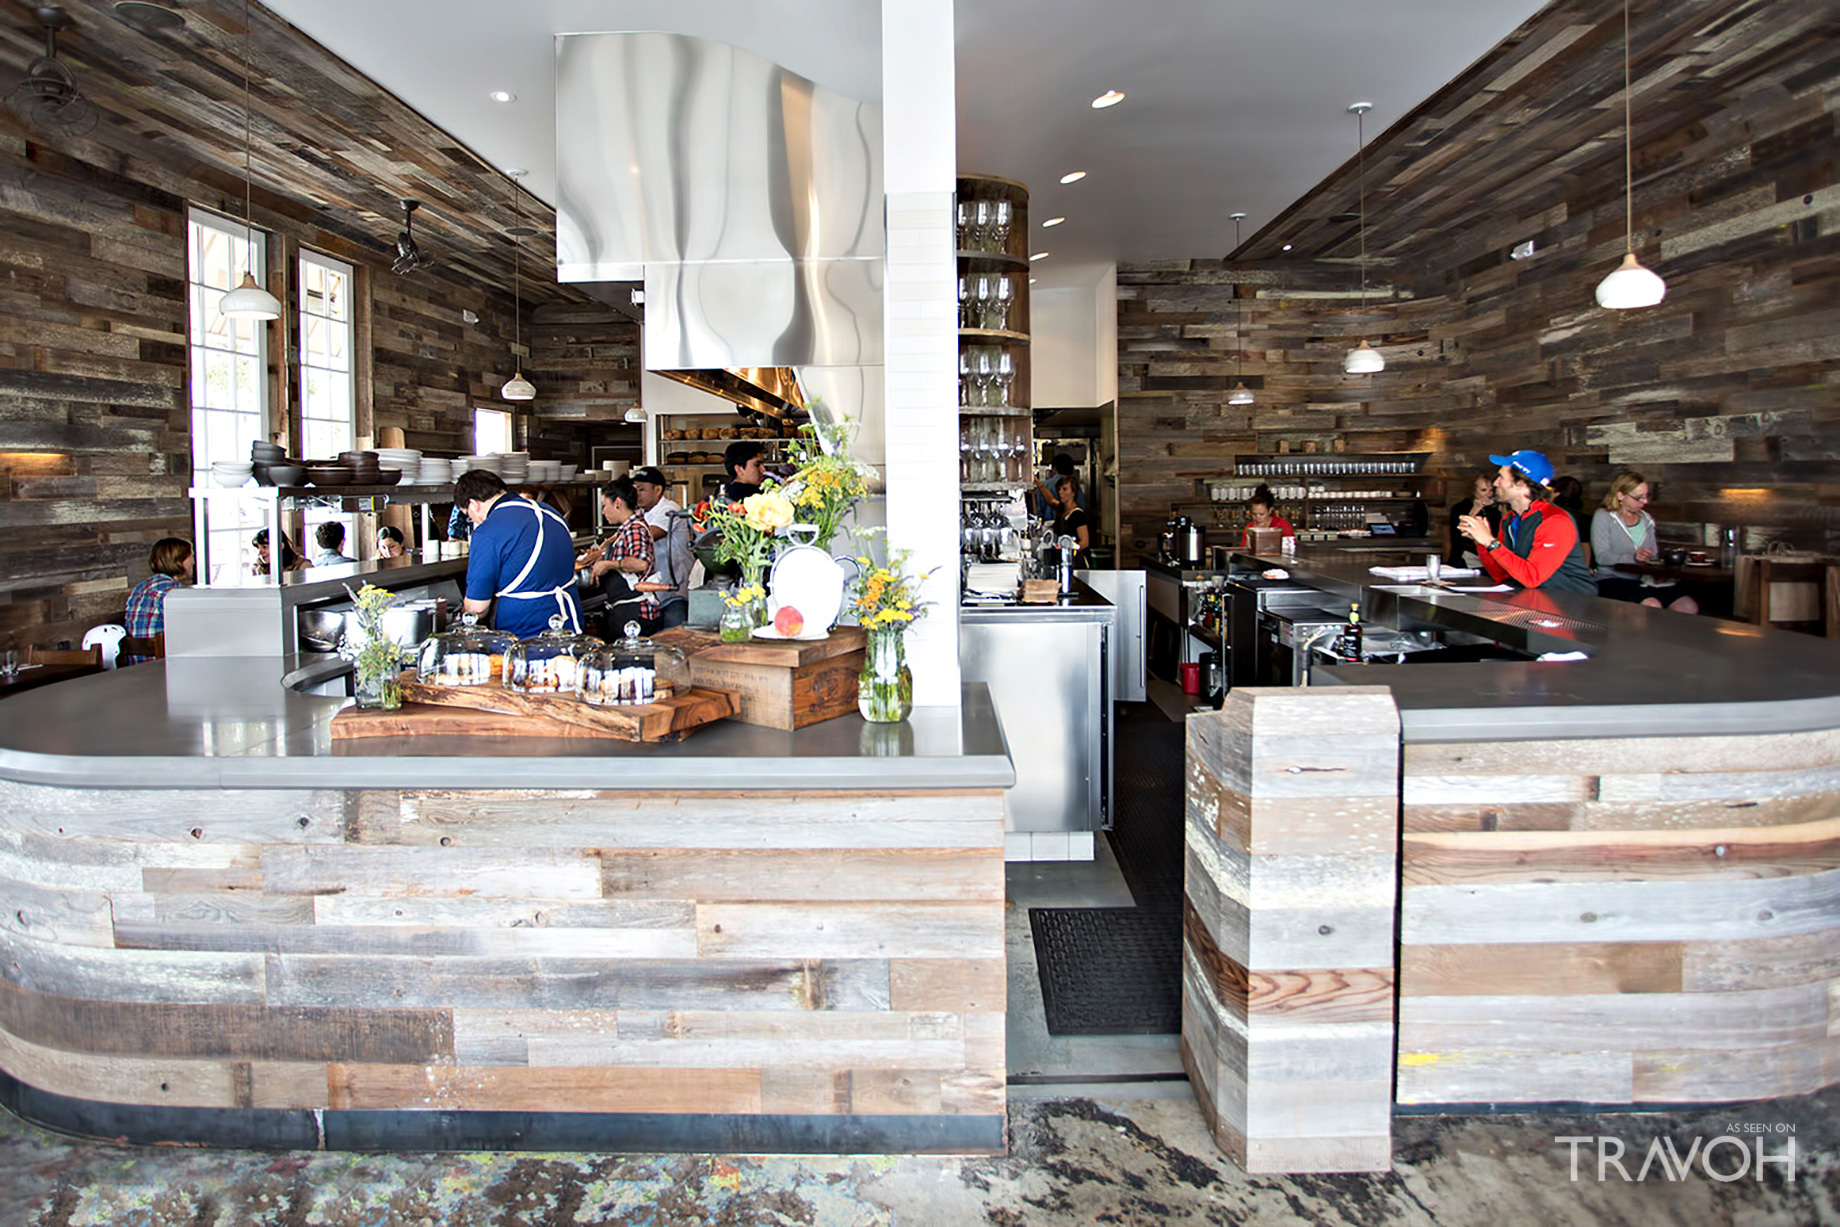 Outerlands Restaurant - 4001 Judah St, San Francisco, CA, USA